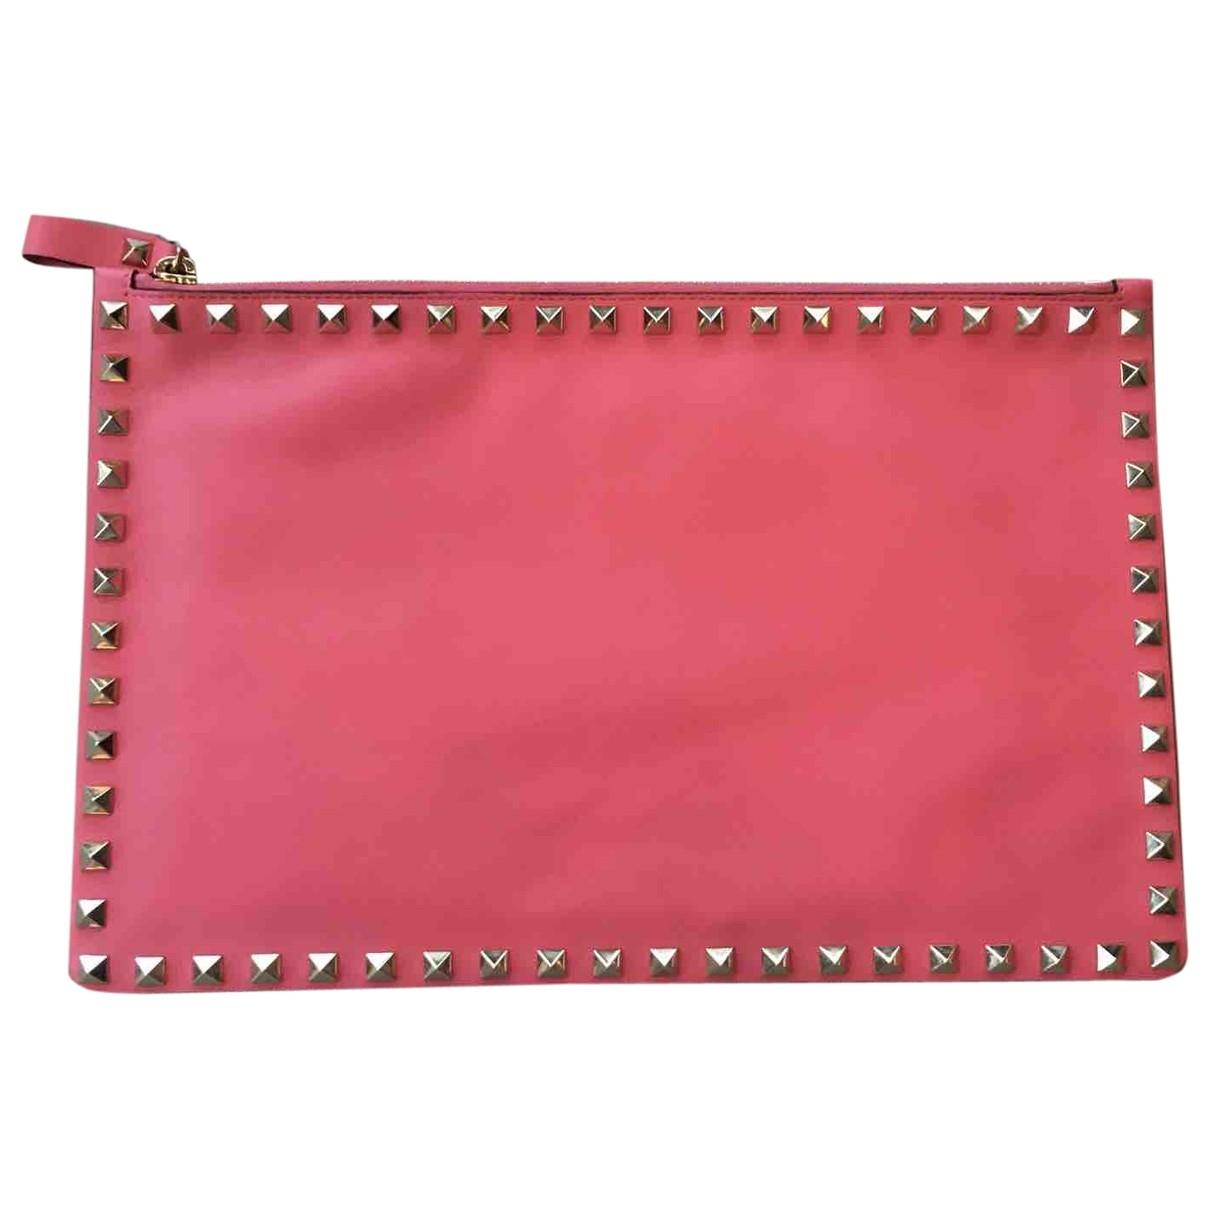 Valentino Garavani Rockstud Pink Leather Clutch bag for Women \N